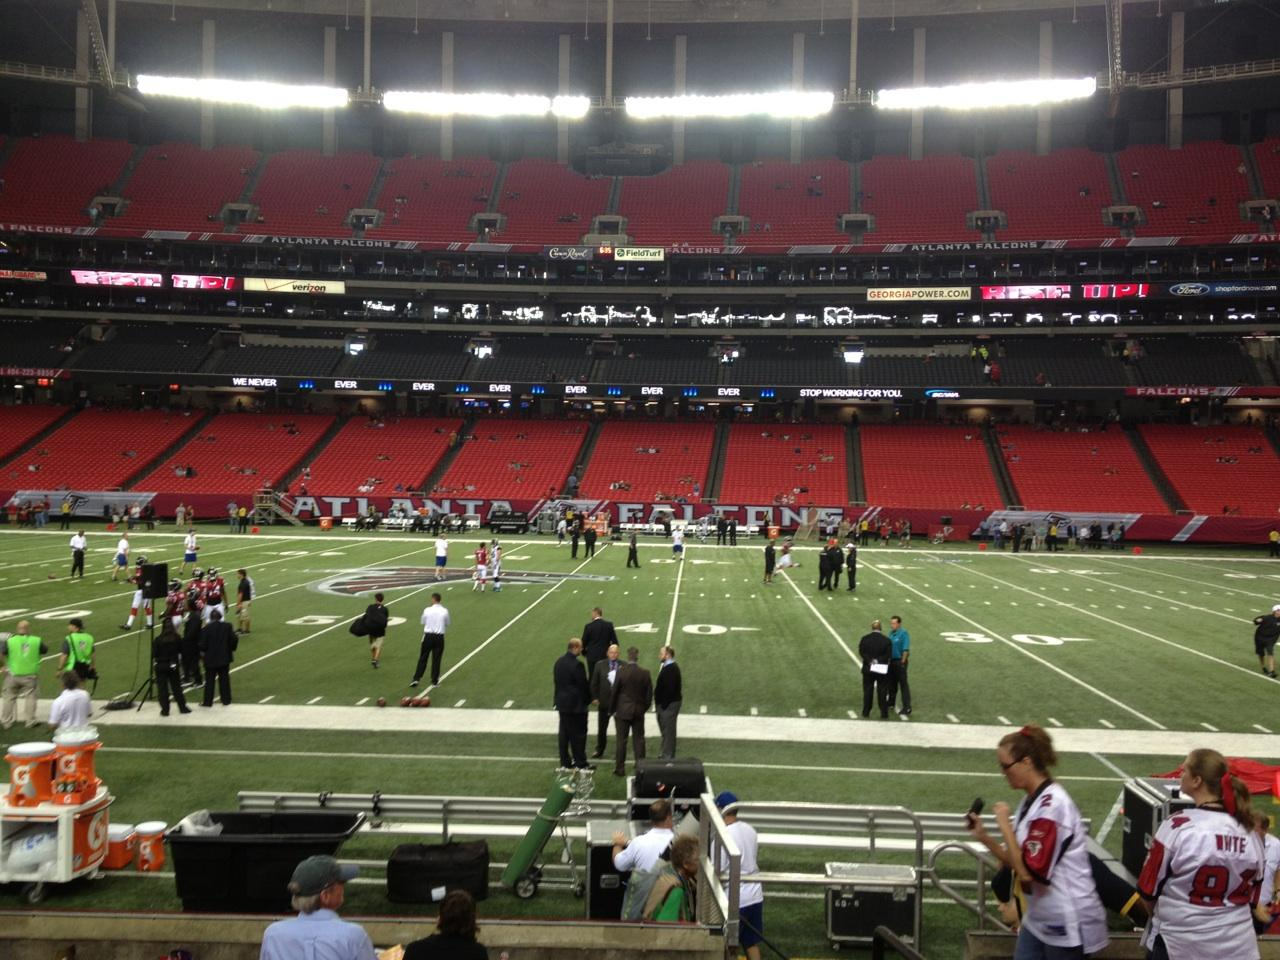 Georgia Dome Section 115 Row 8 Seat 20